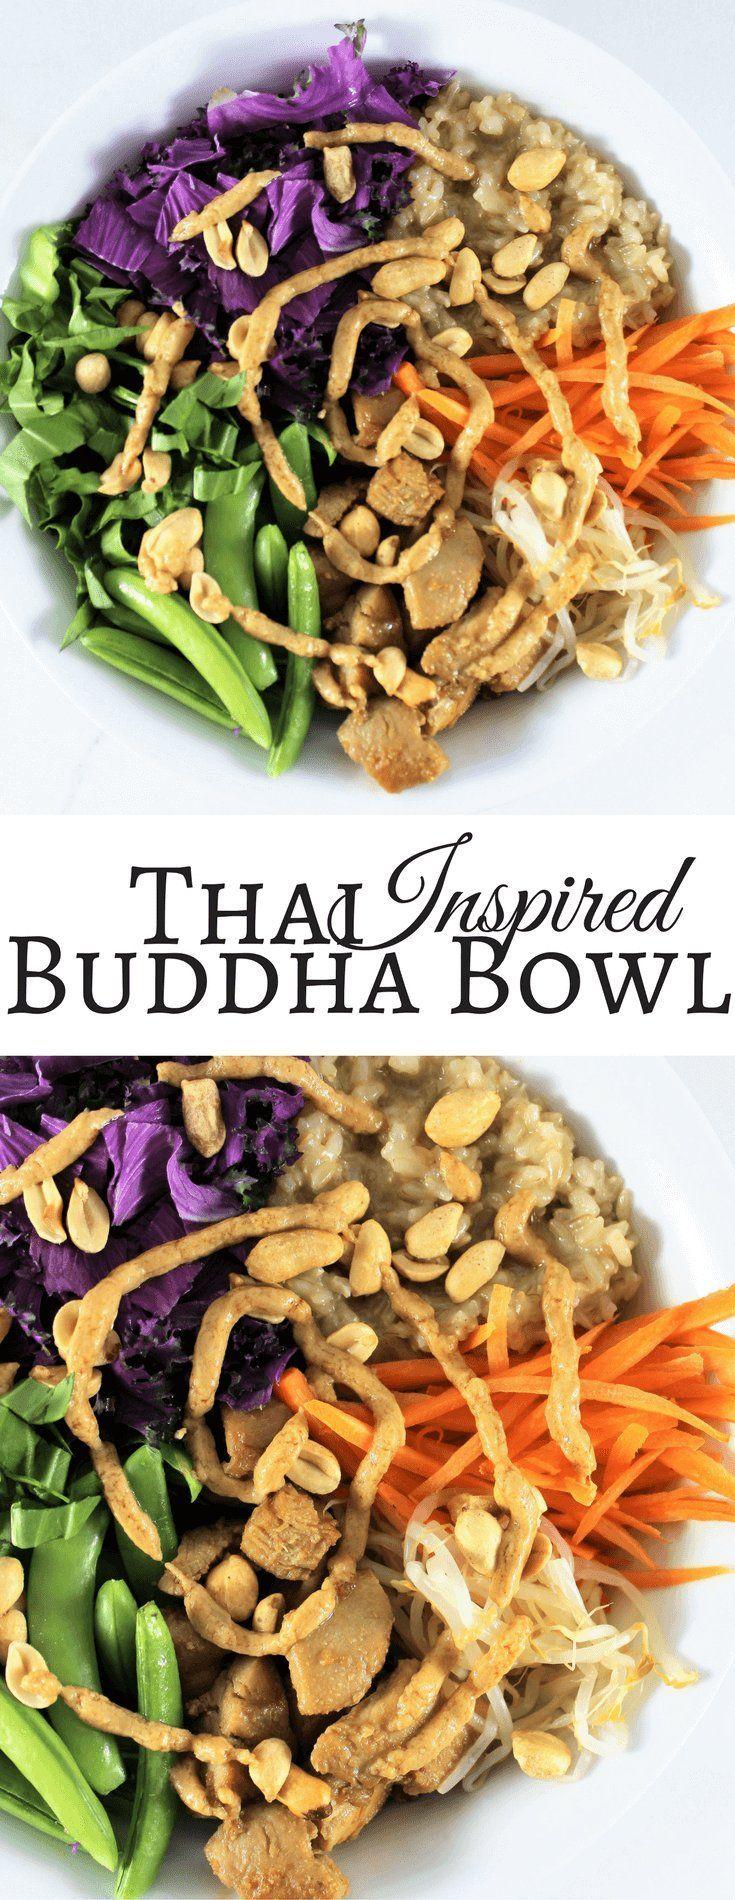 Thai Inspired Buddha Bowl {+ Round Up} | Buddha Bowl | Healthy | Macro bowl | Thai